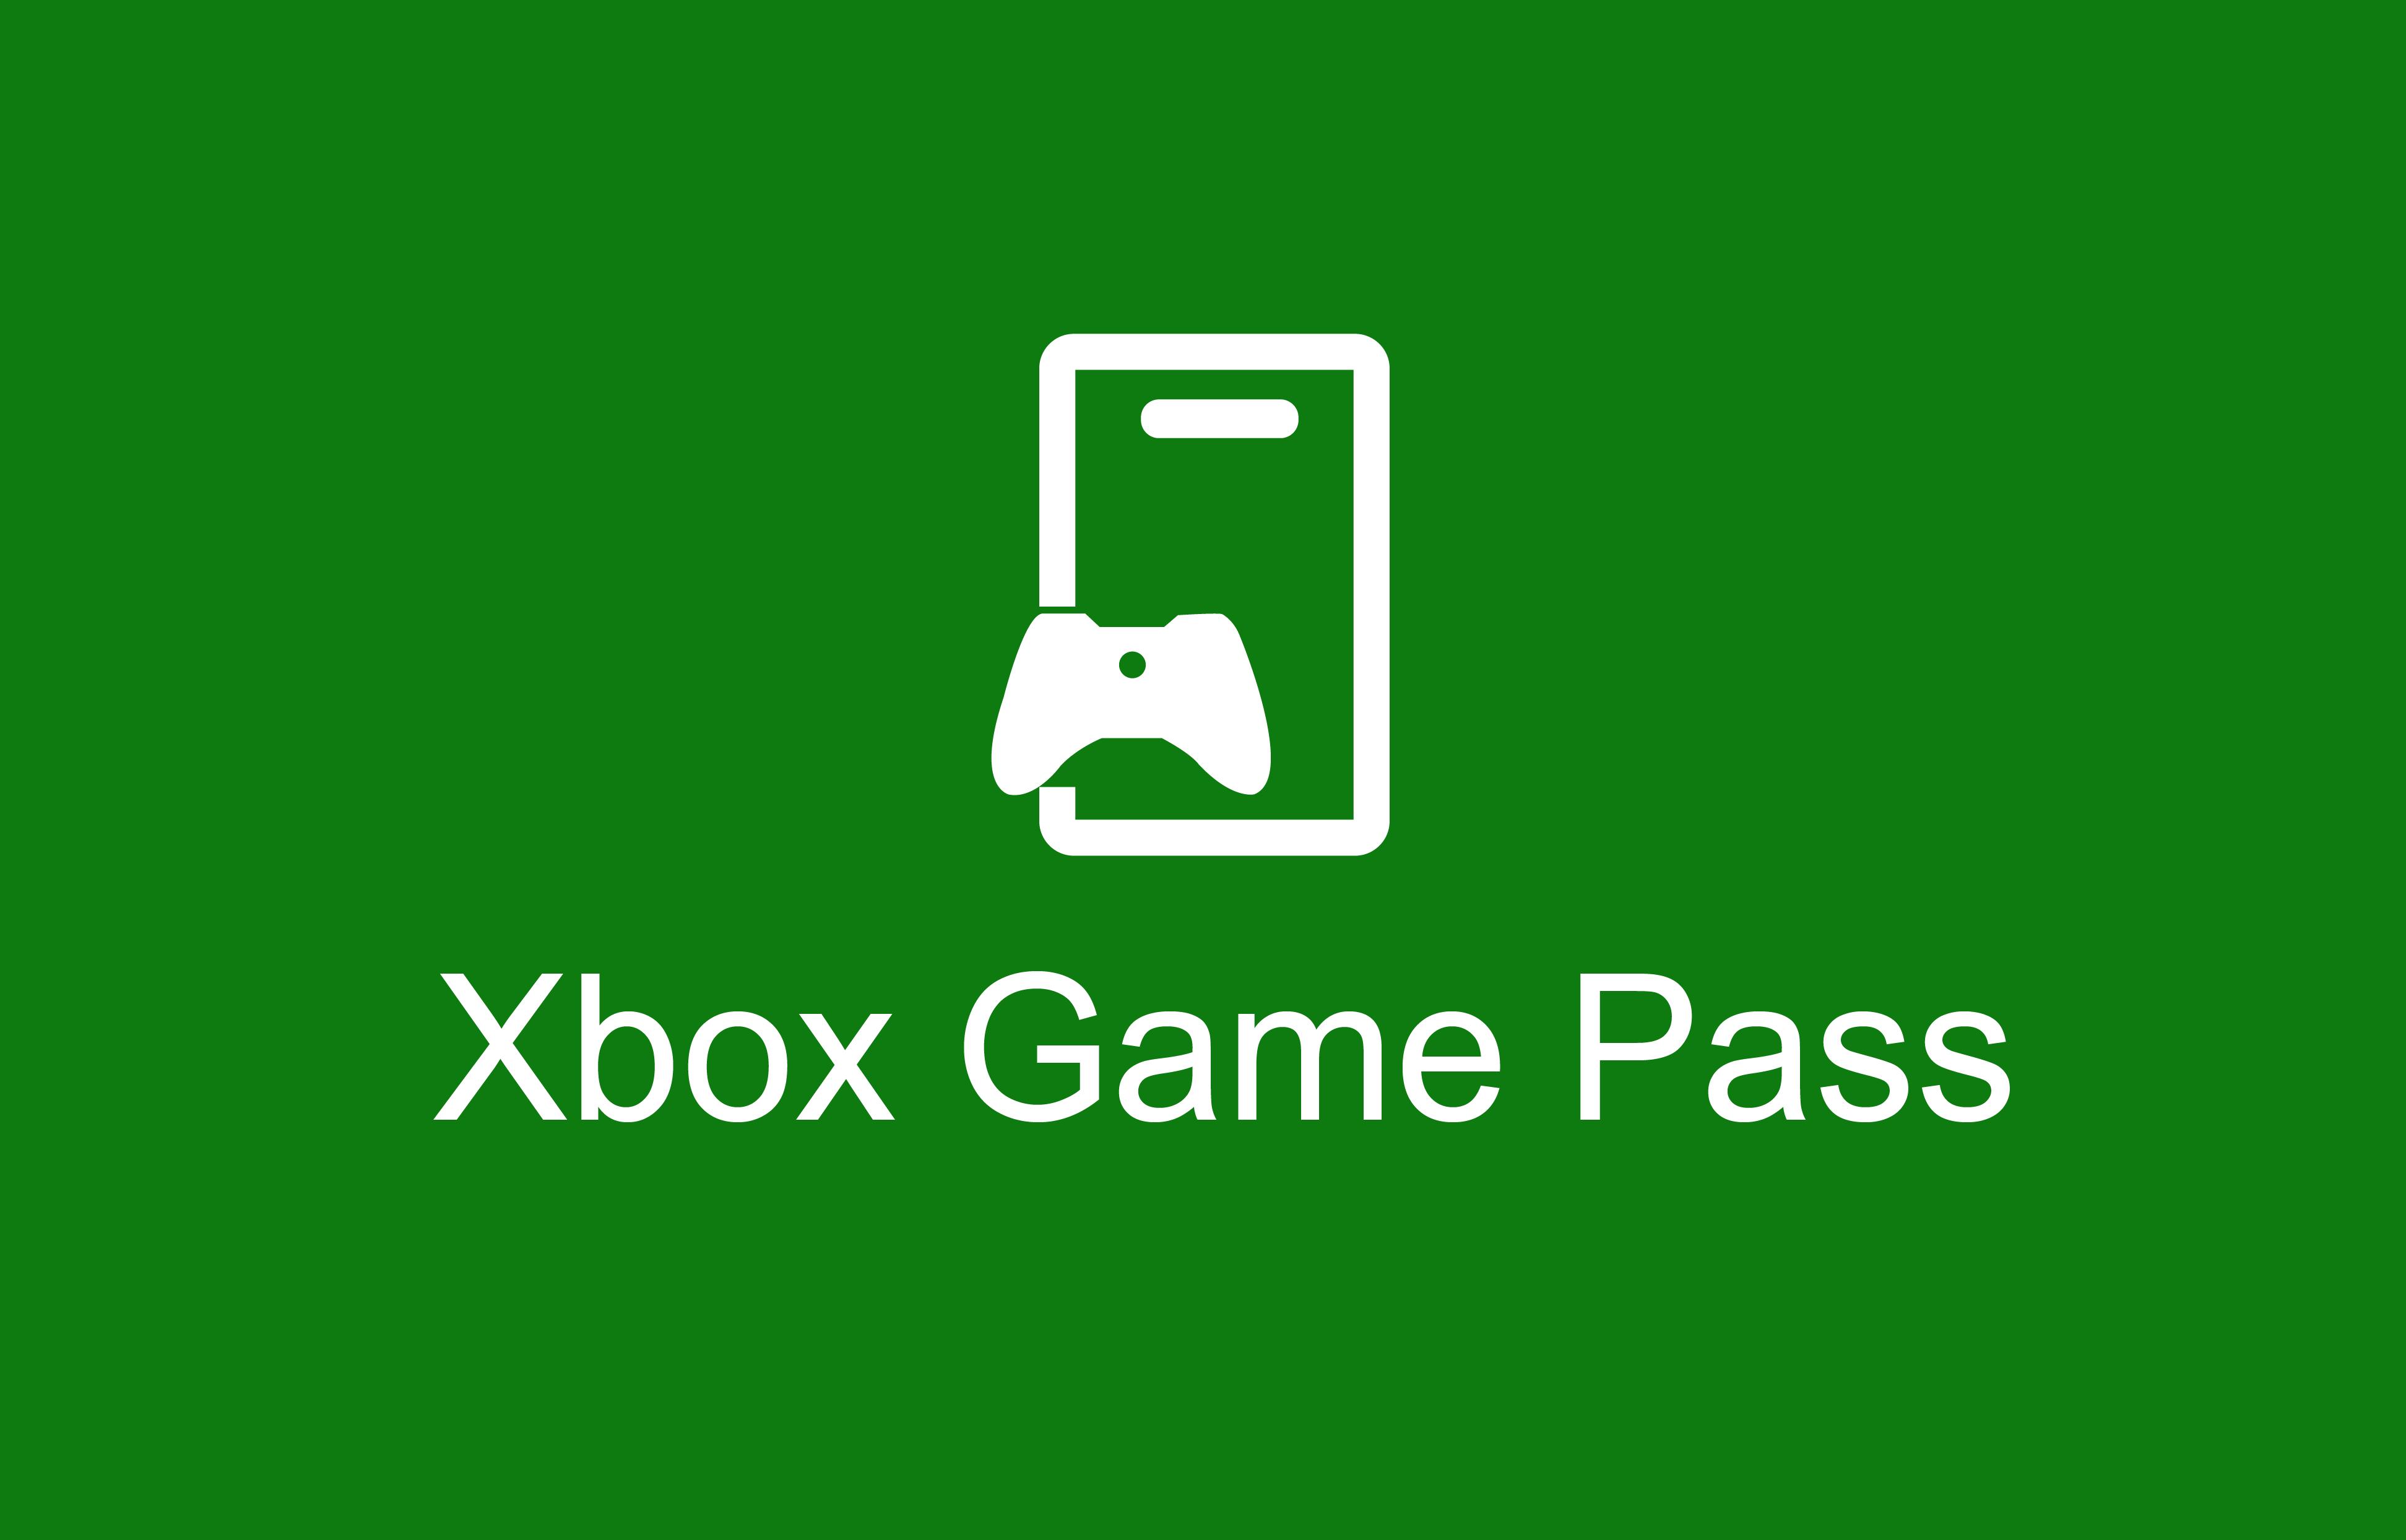 4436d4173 لعبة Sniper Elite 4 أحدث الألعاب المنضمة لخدمة Xbox Game Pass ...